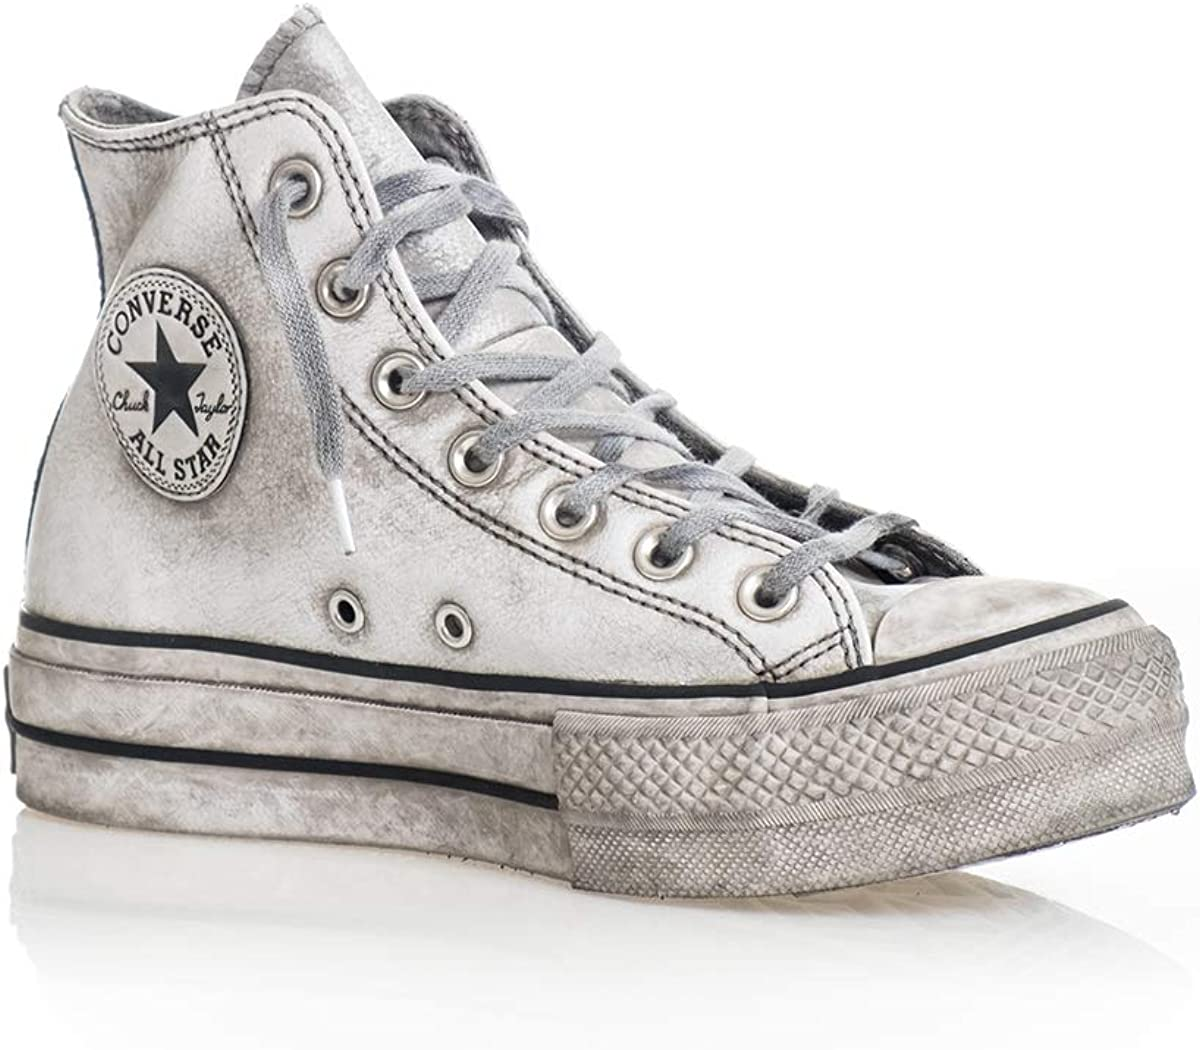 Scarpe da Donna Sneaker Converse all Star Platform Pelle Nera Donna FW 19-20